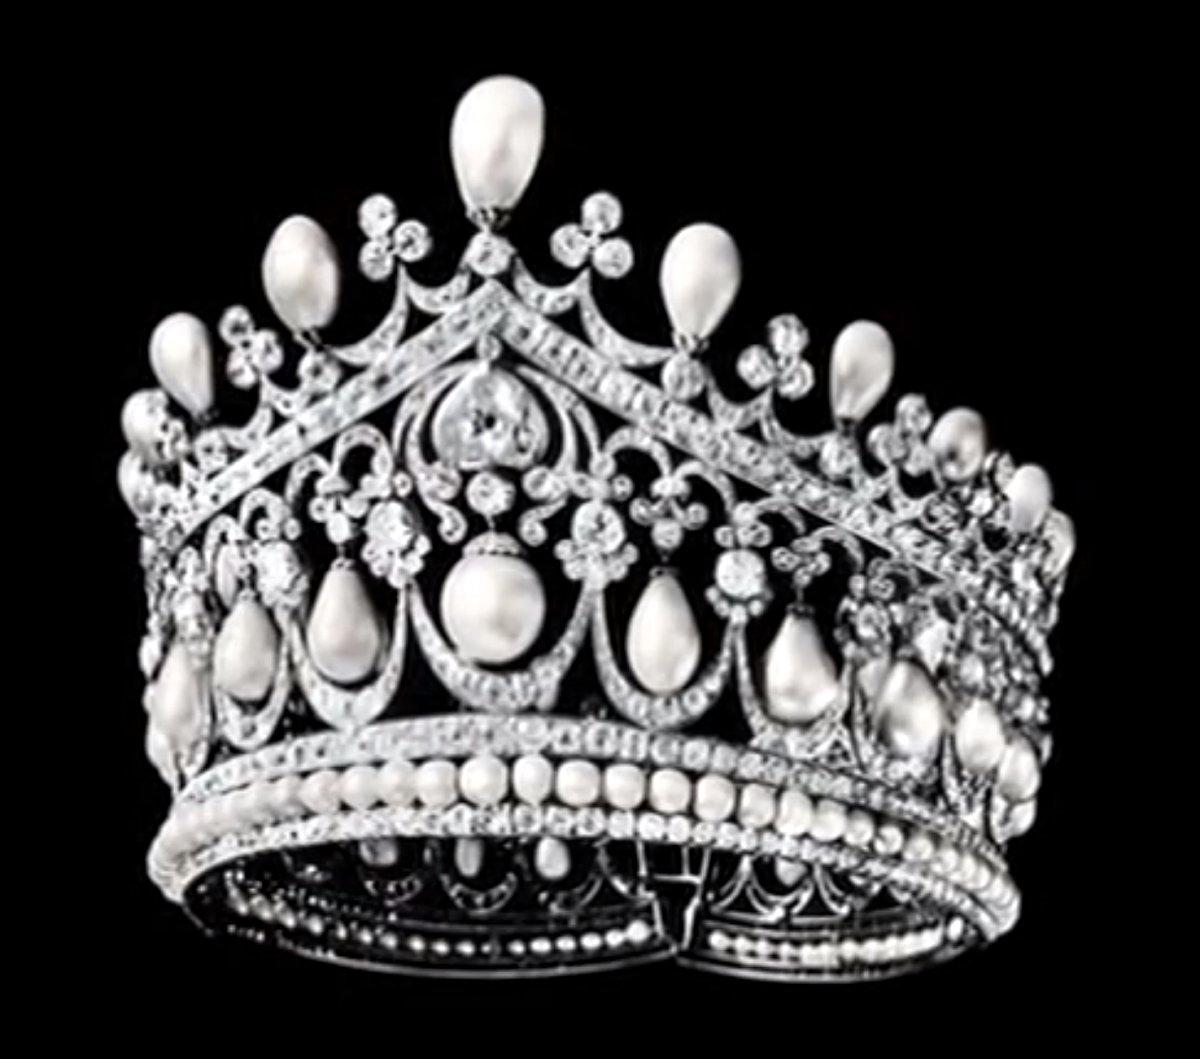 Empress Alexandra's Pearl and Diamond Tiara, ca. 1922